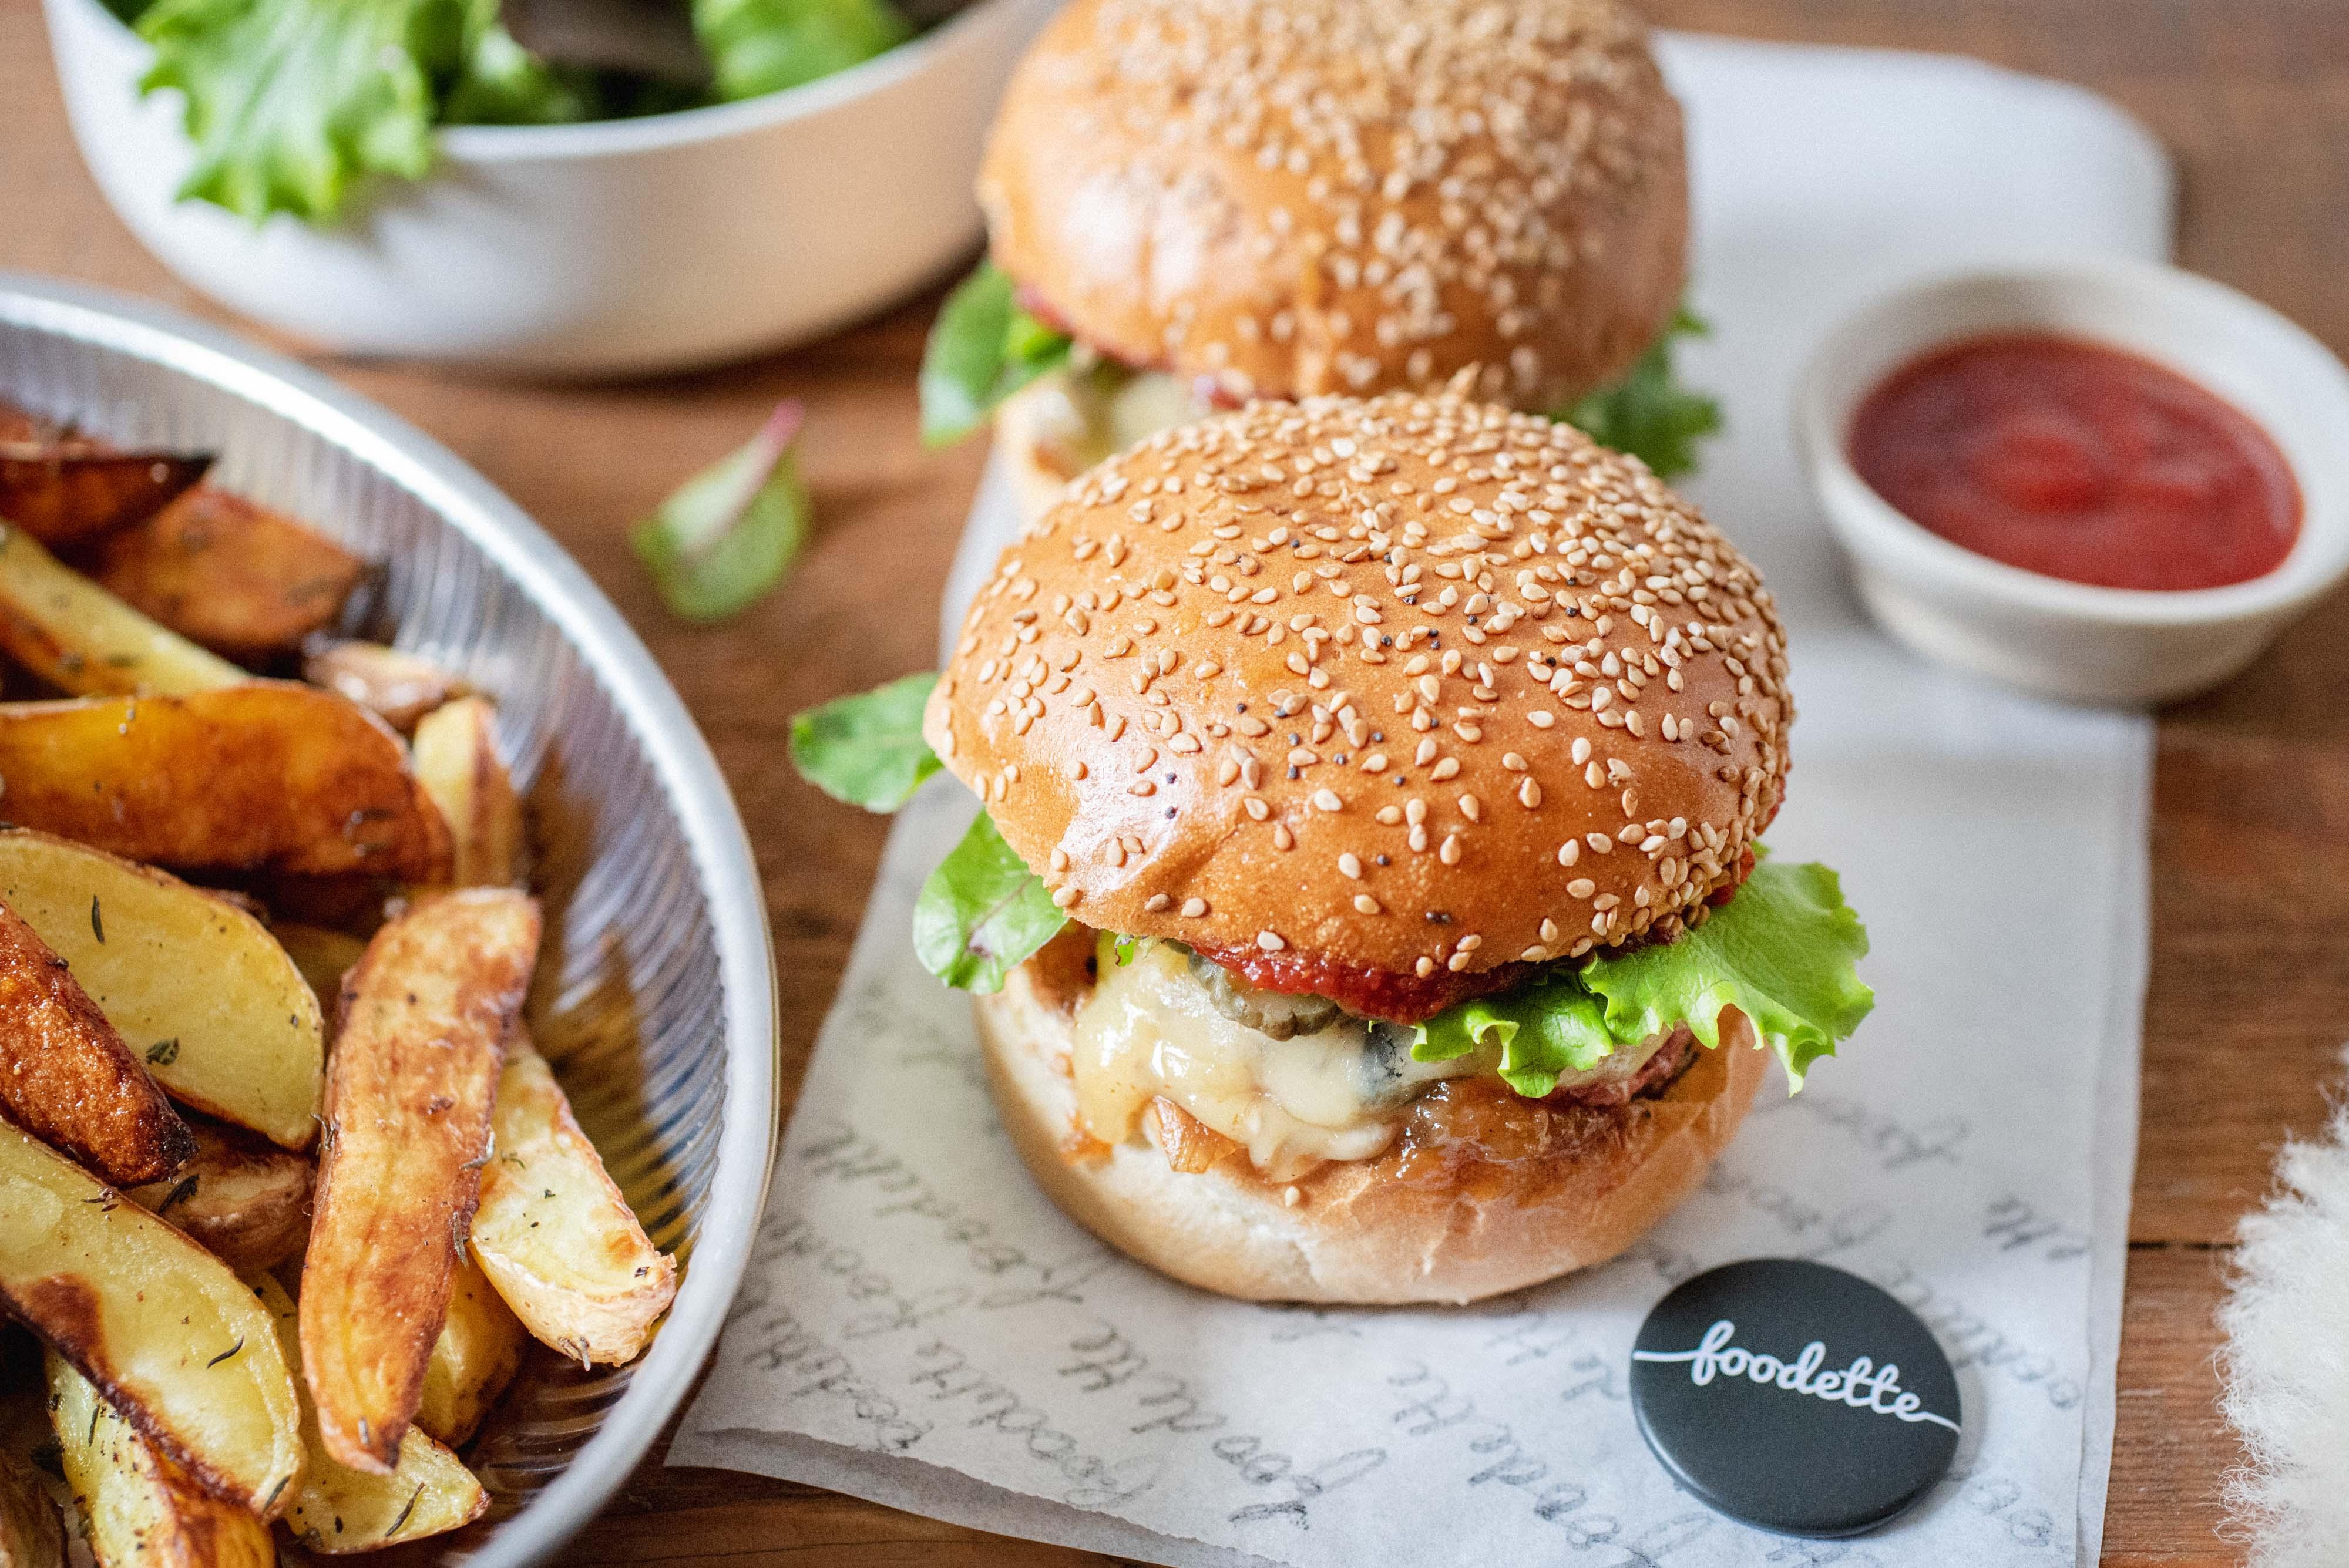 Burger montagnard au Morbier fondant